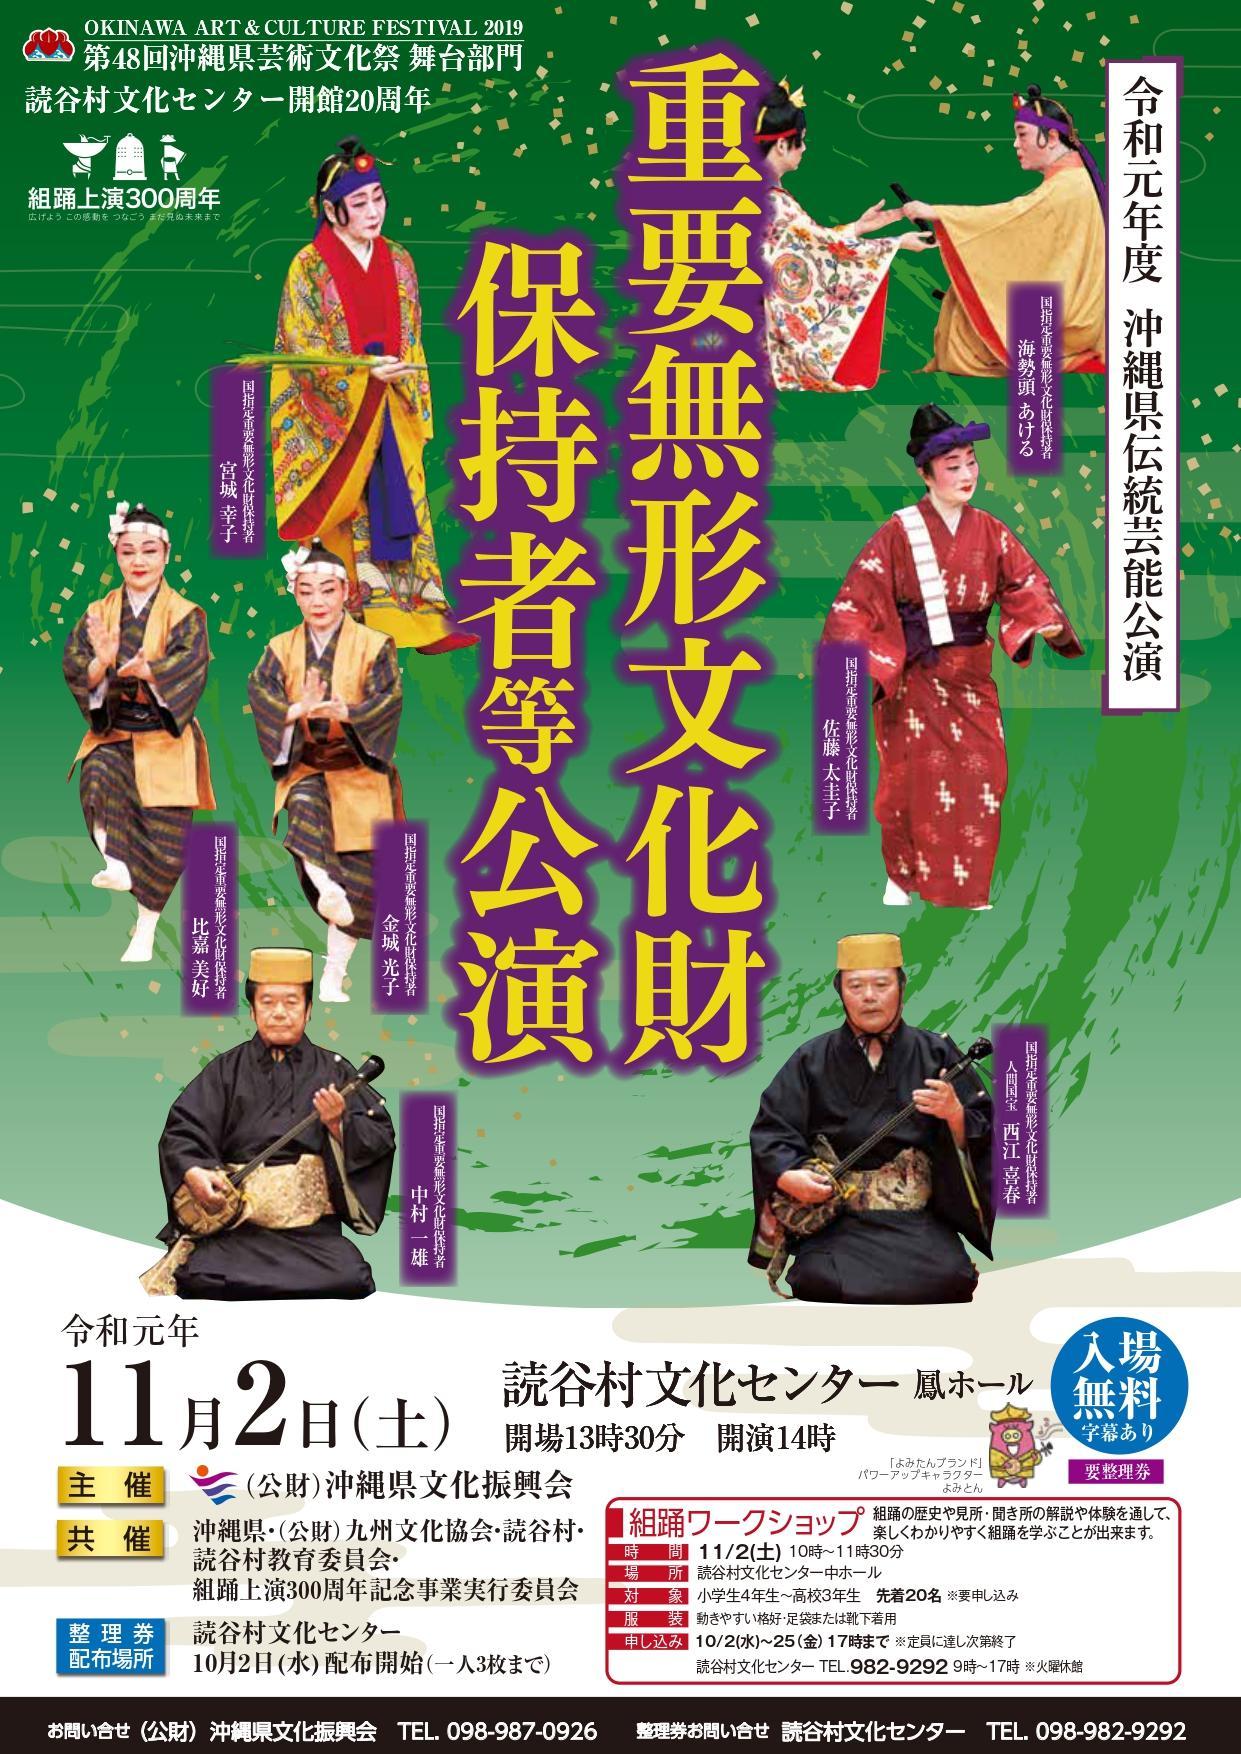 http://okicul-pr.jp/kariyushi/news/cb928b8887871f35b242f998110e4ef101a5ef03.jpg